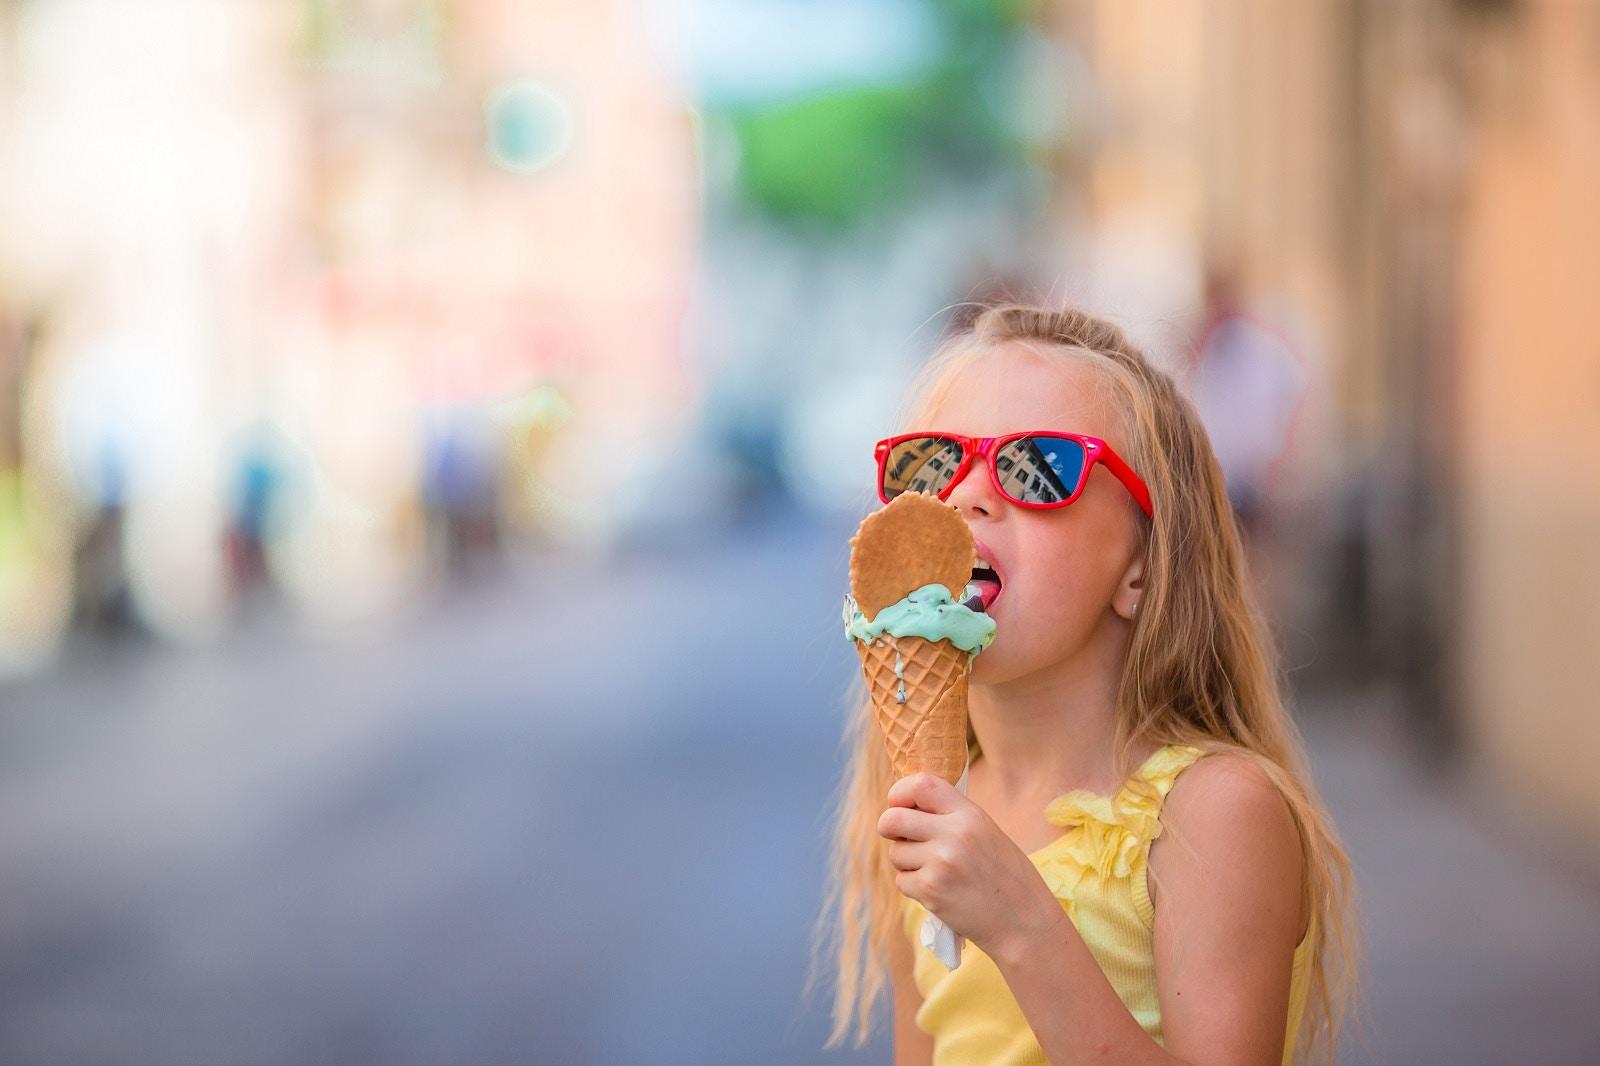 A girl wearing sunglasses eats gelato from a cone in Rome © TravnikovStudio / Shutterstock